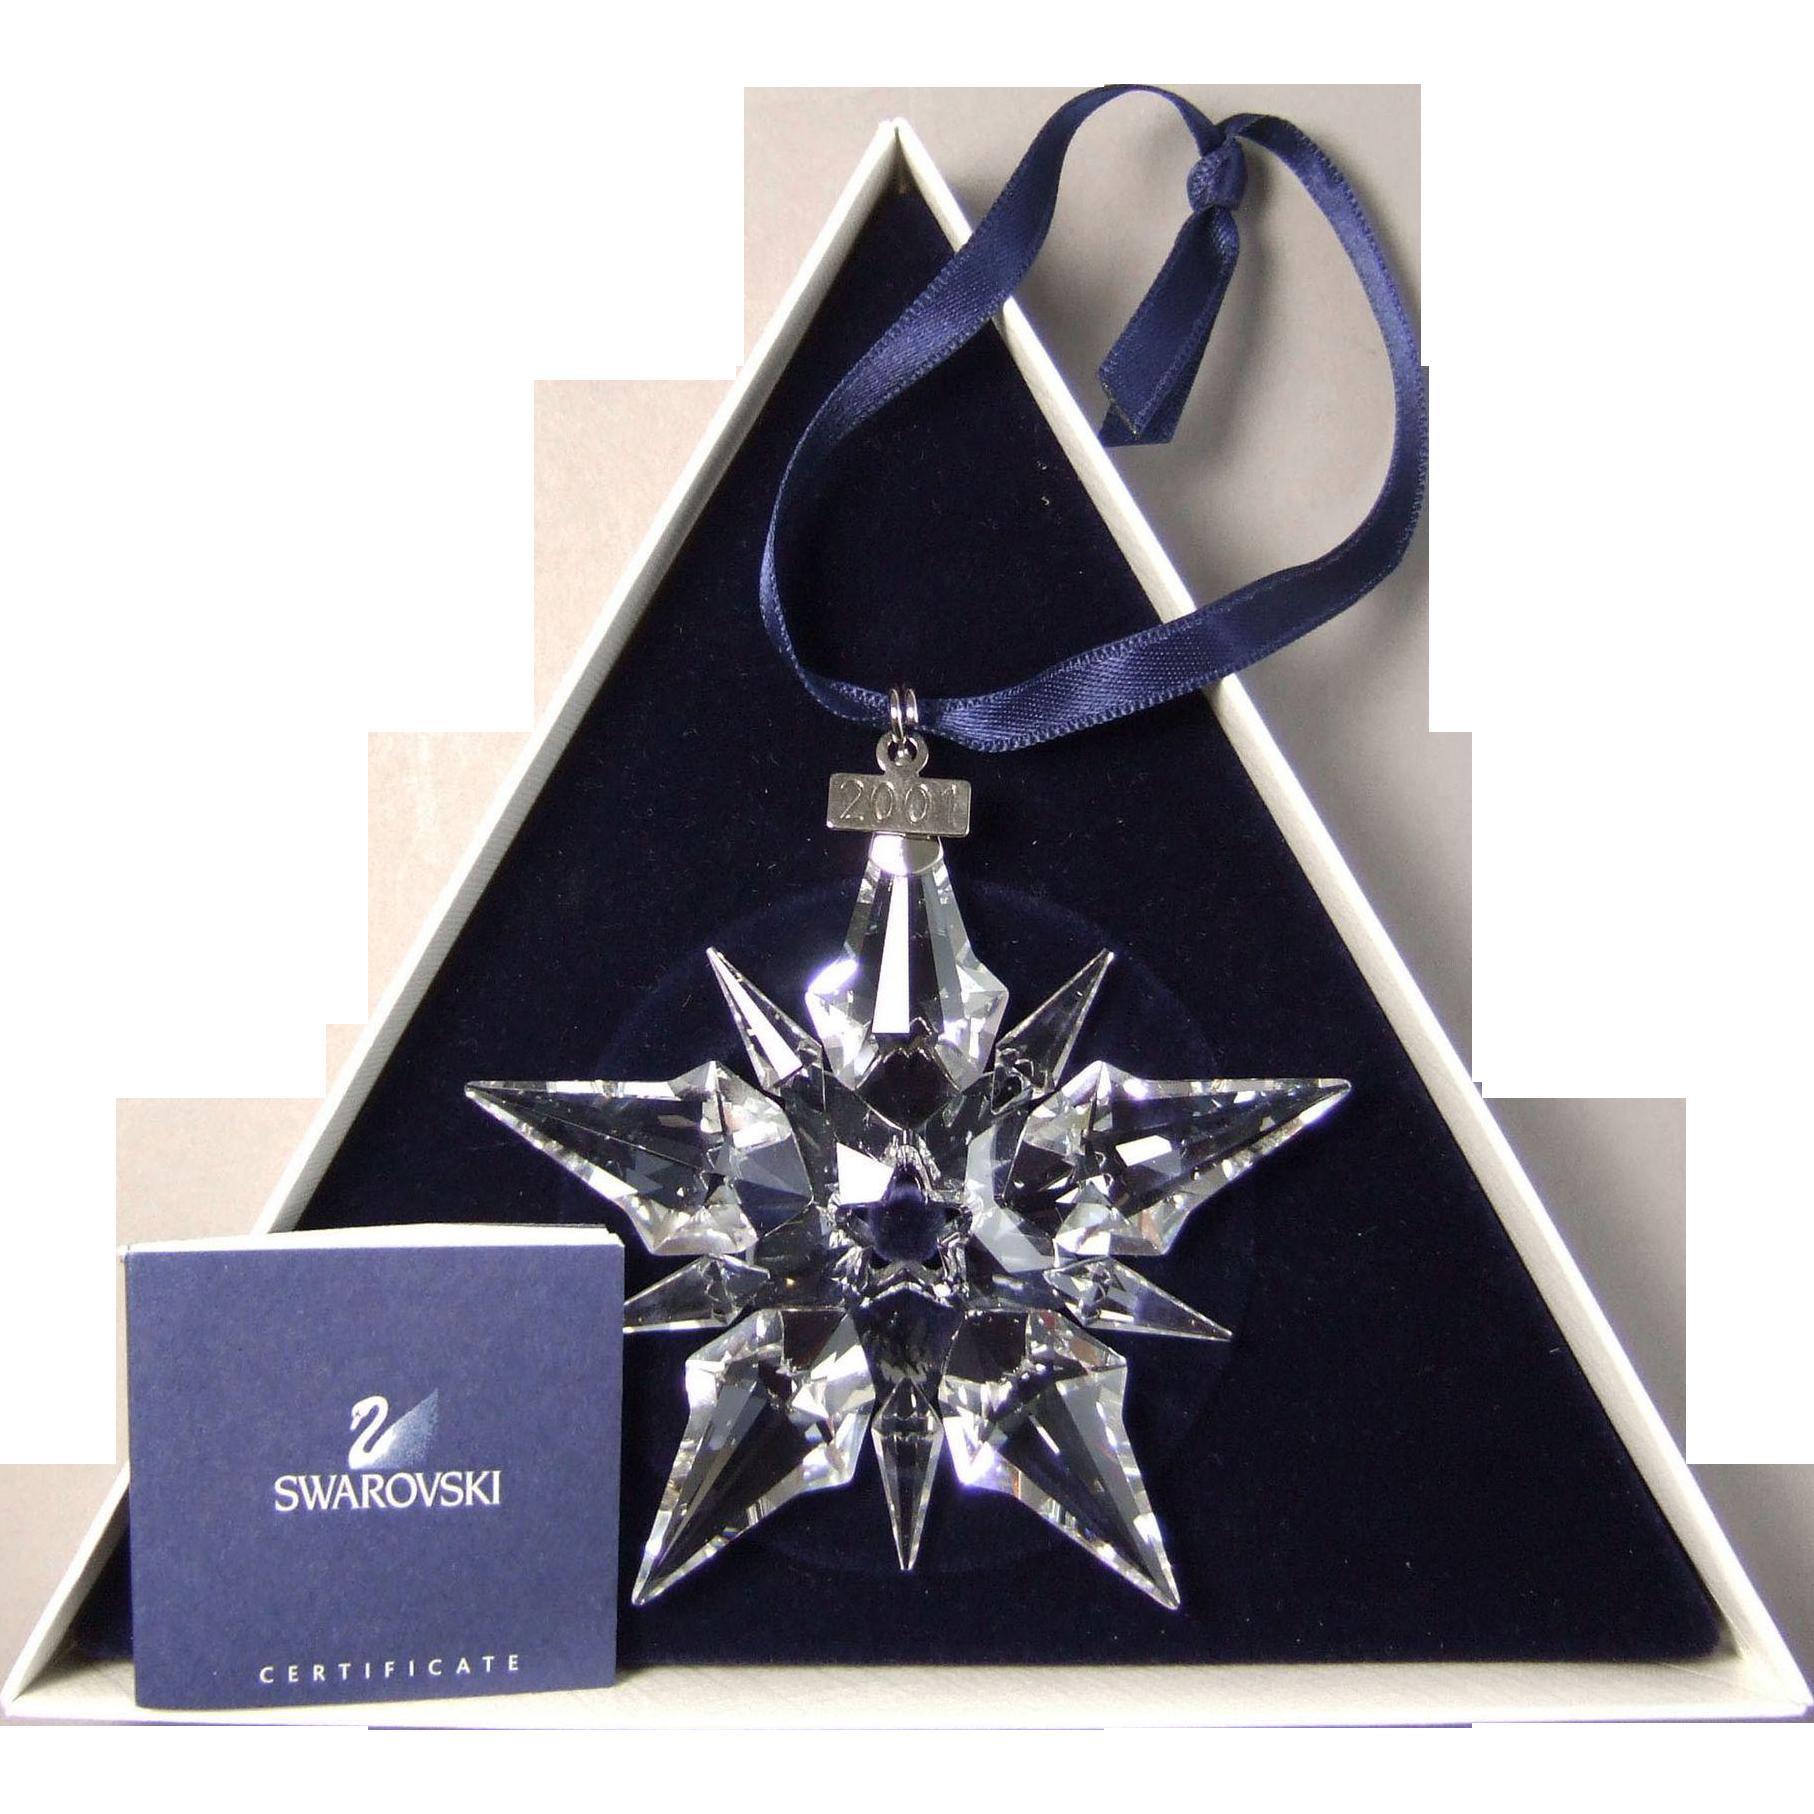 2001 Swarovski Crystal Snowflake Annual Edition Christmas Ornament